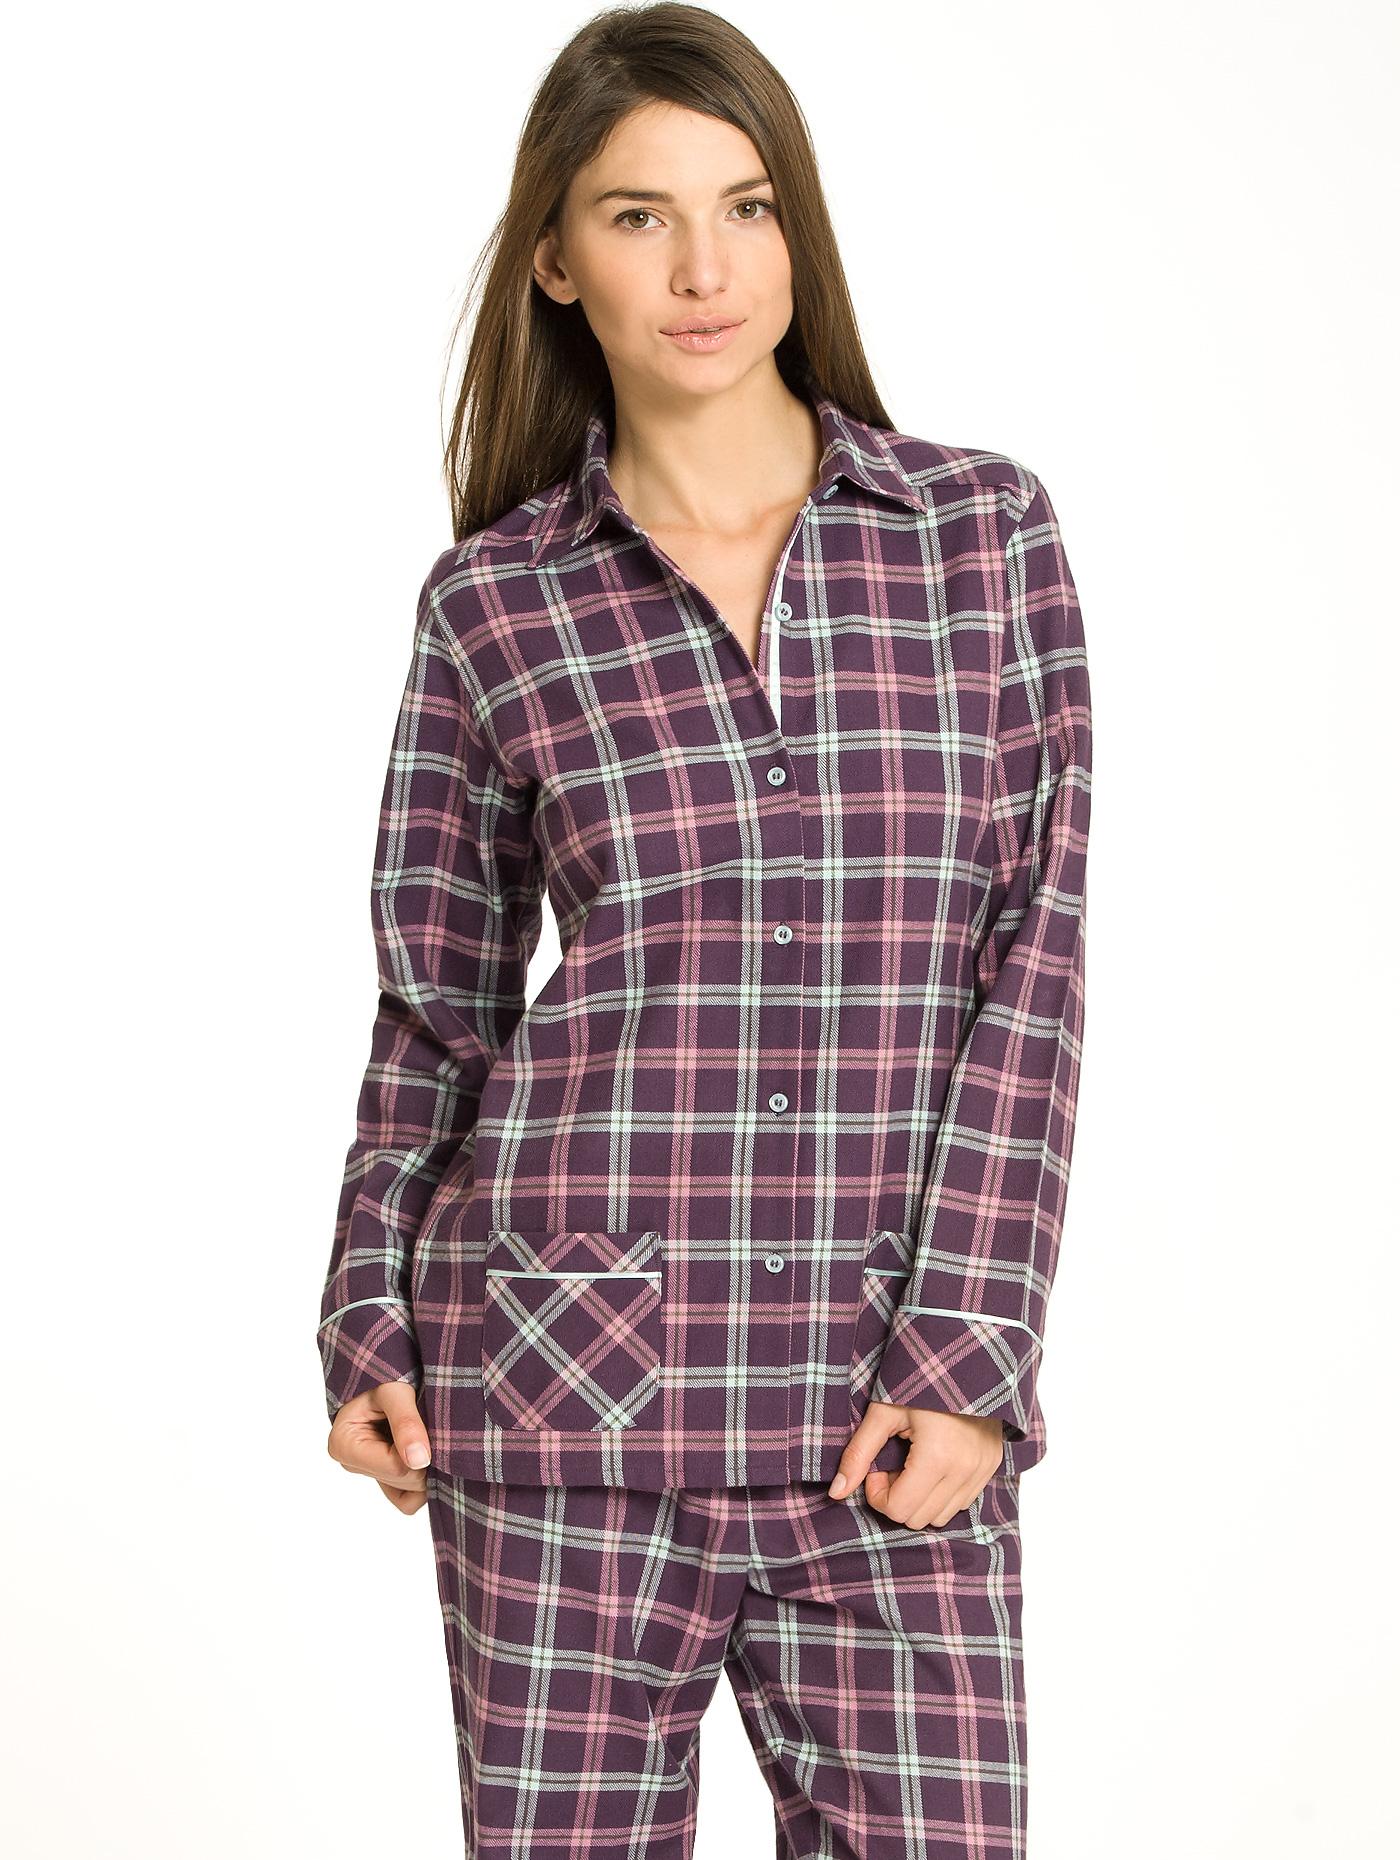 flanell pyjama damen bei karstadt online kaufen. Black Bedroom Furniture Sets. Home Design Ideas